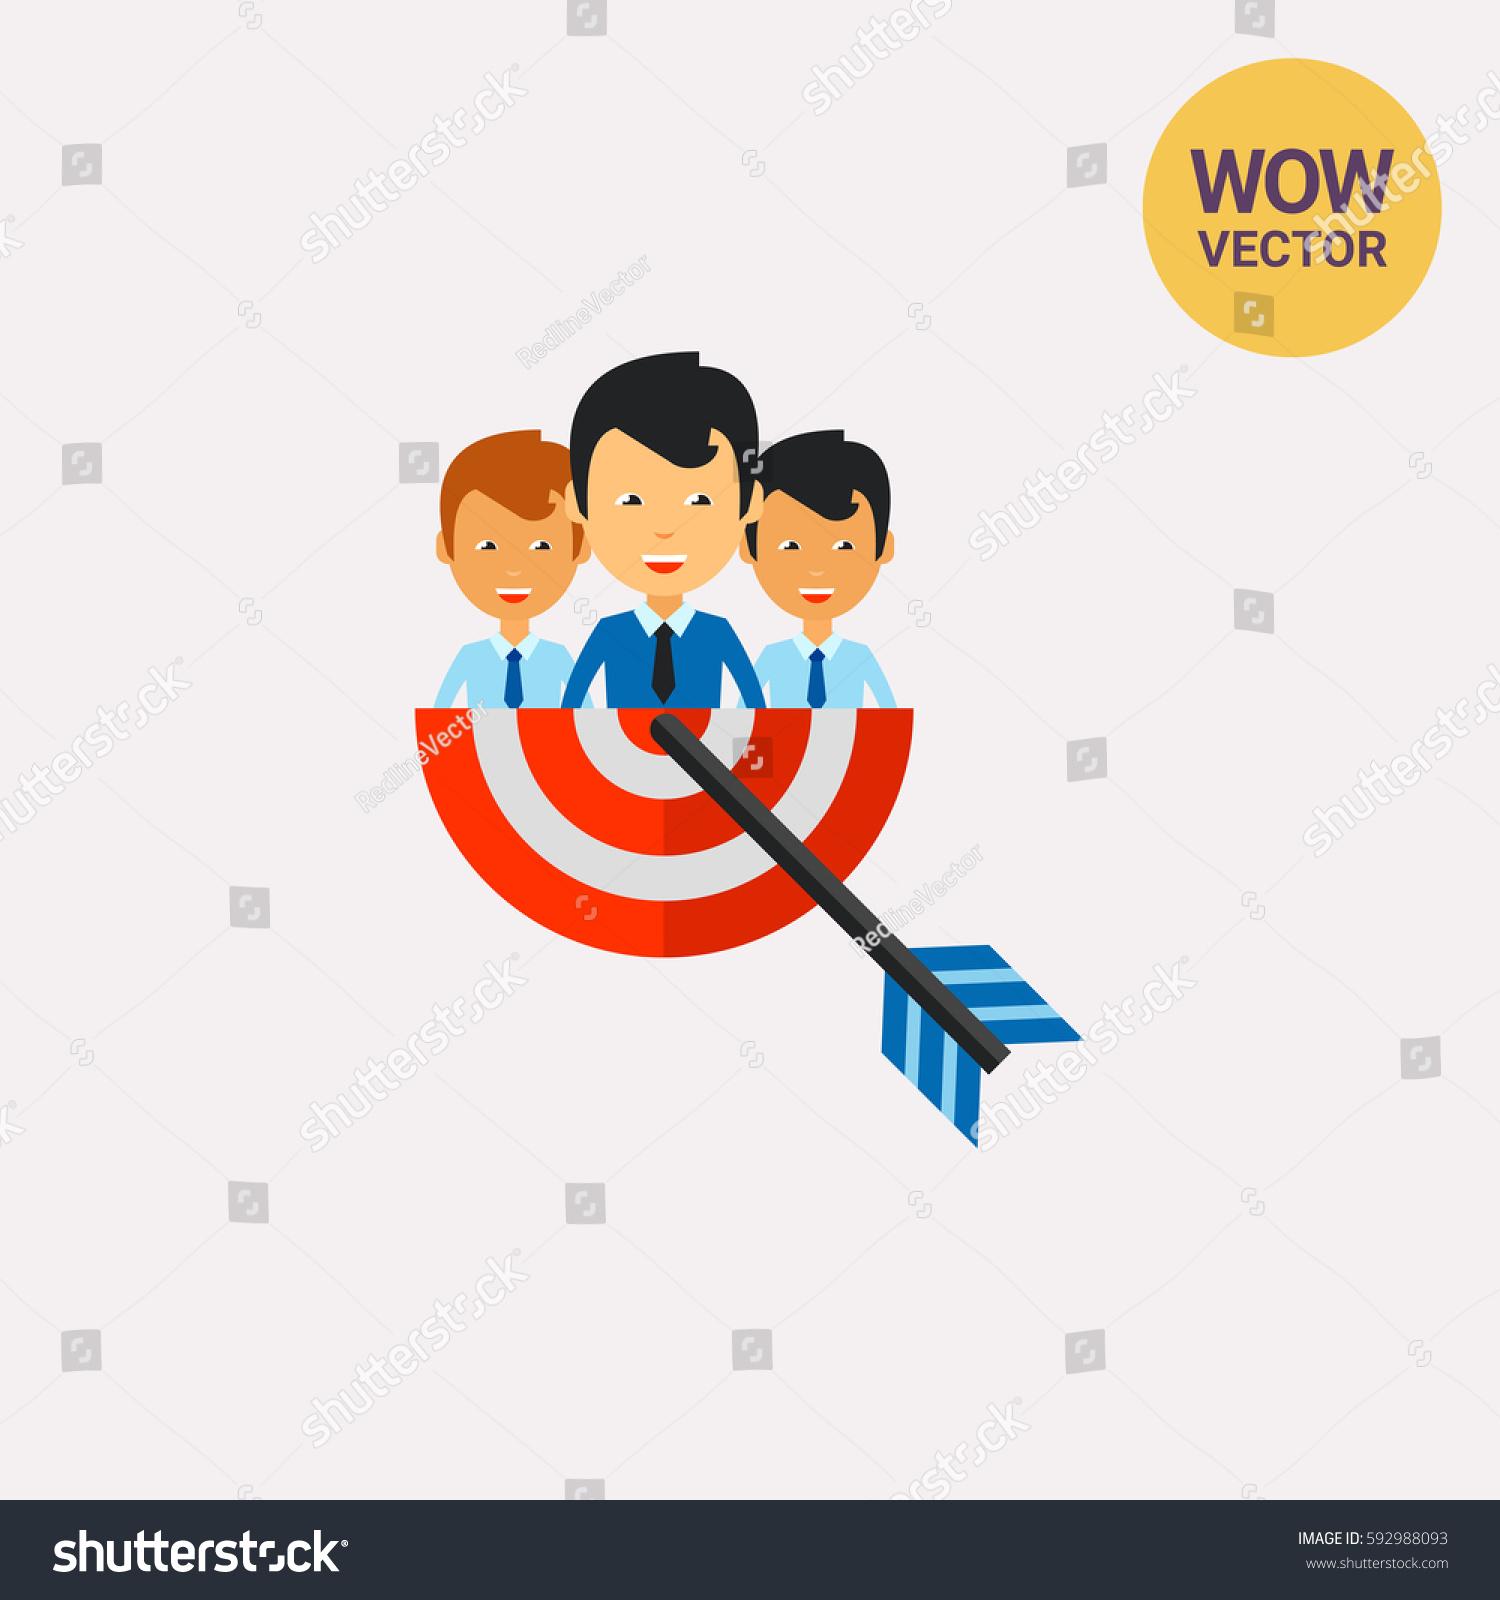 Businesspeople Target Arrow Icon 592988093